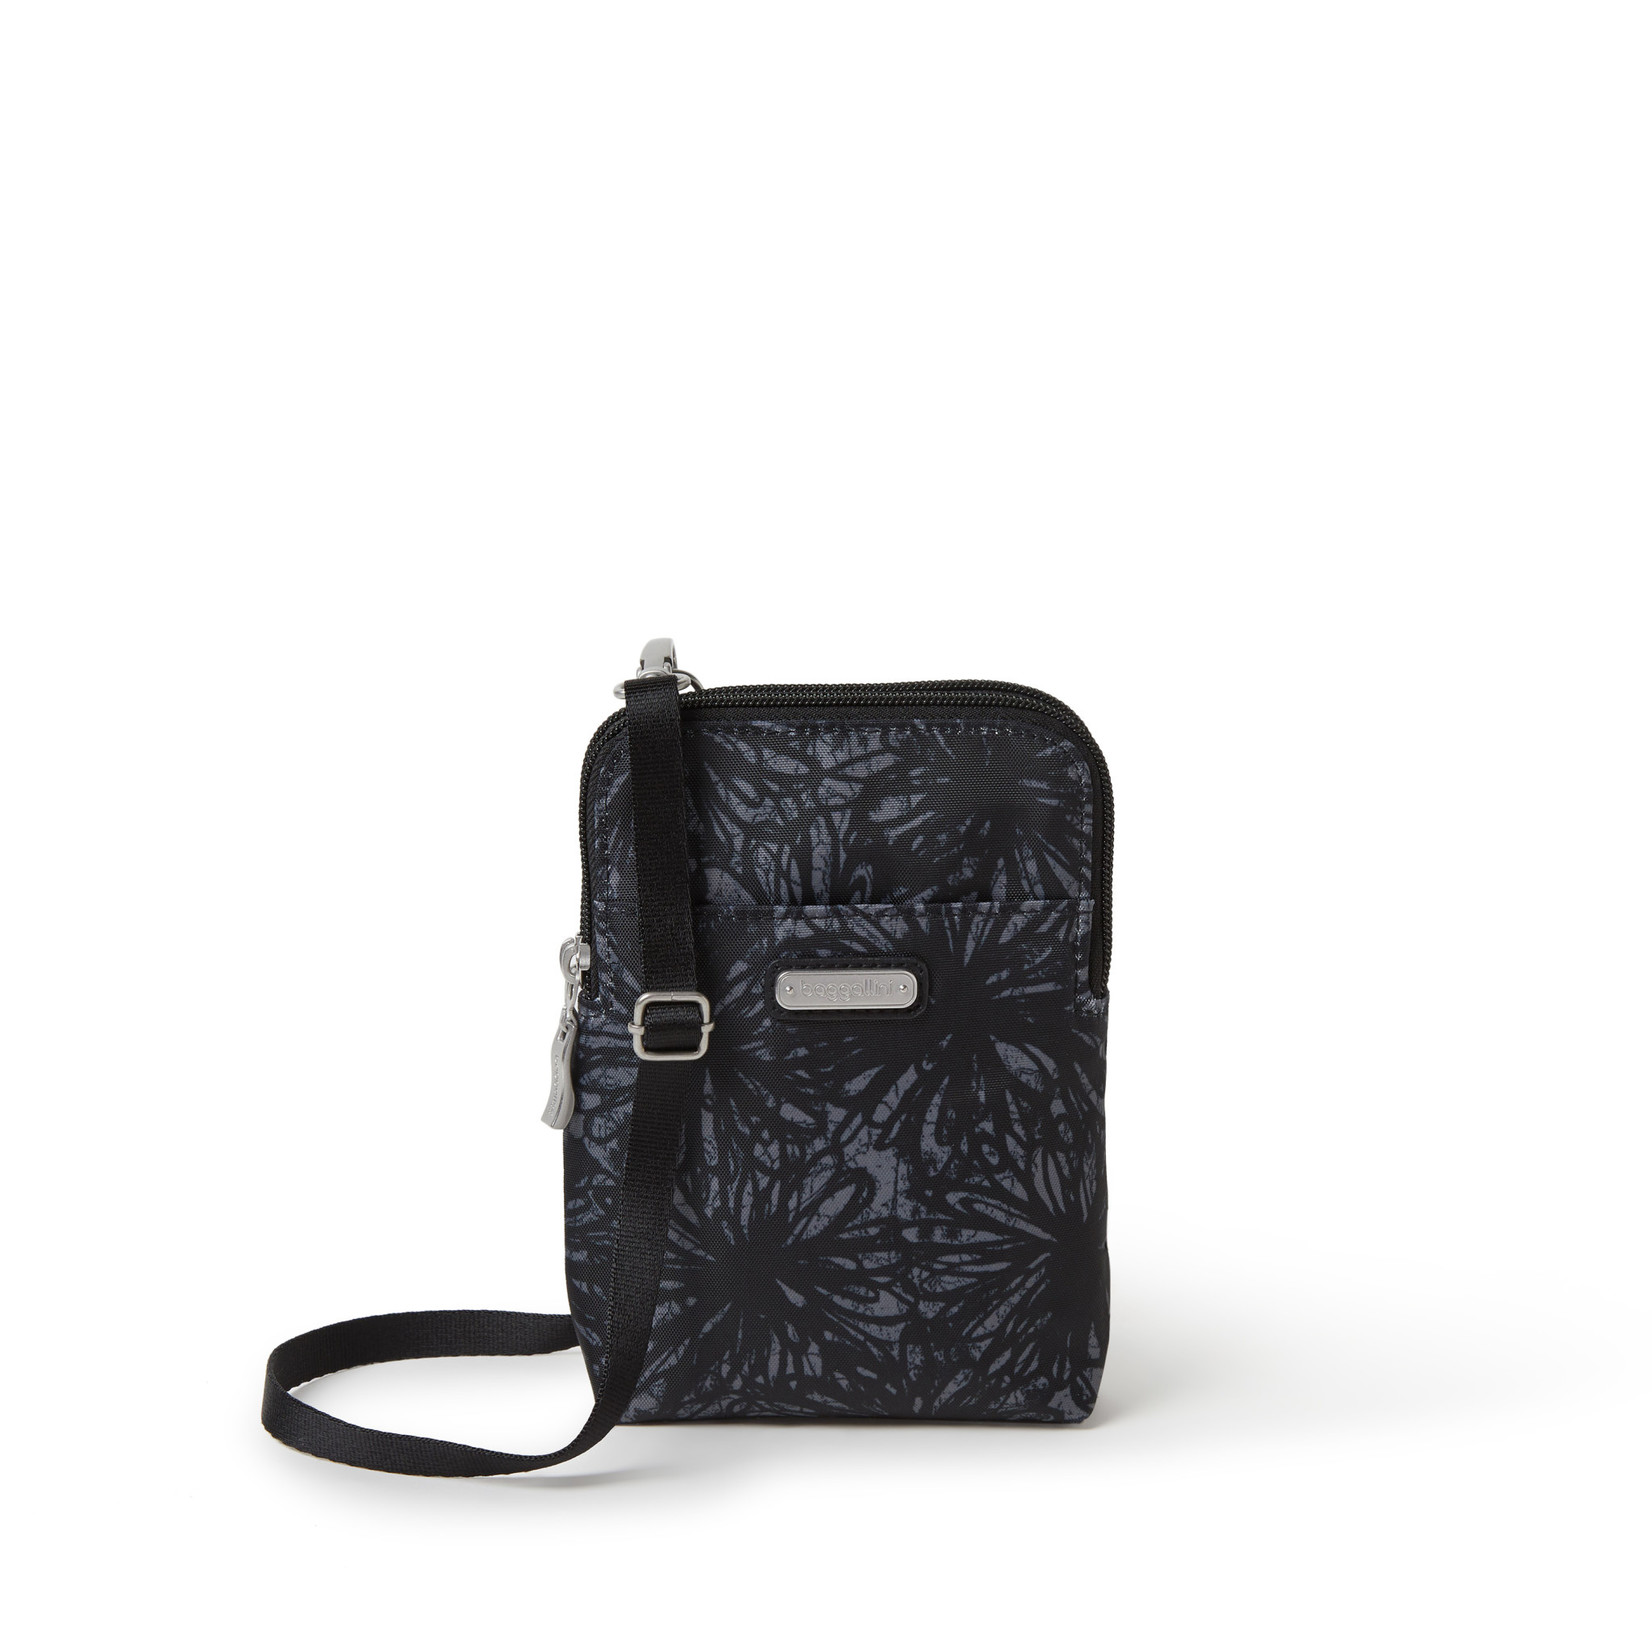 Baggallini Take Two RFID Bryant Crossbody - Onyx Floral